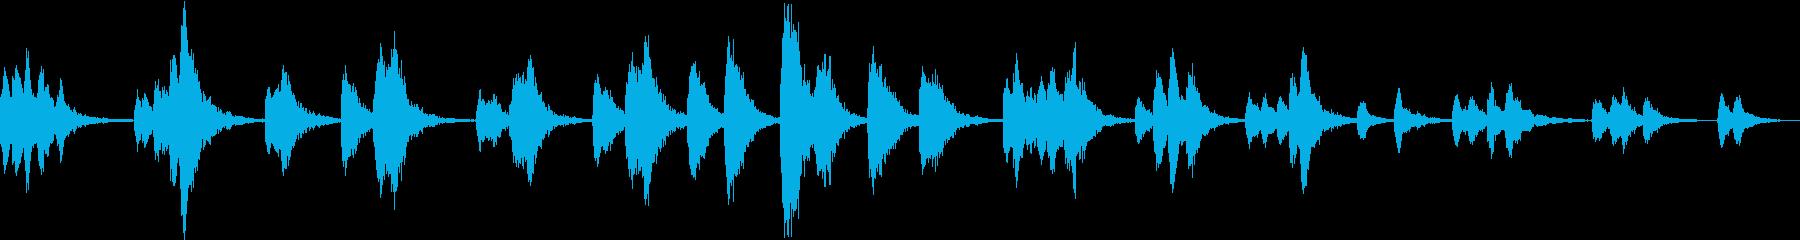 SF映画のロボットのような声です。の再生済みの波形